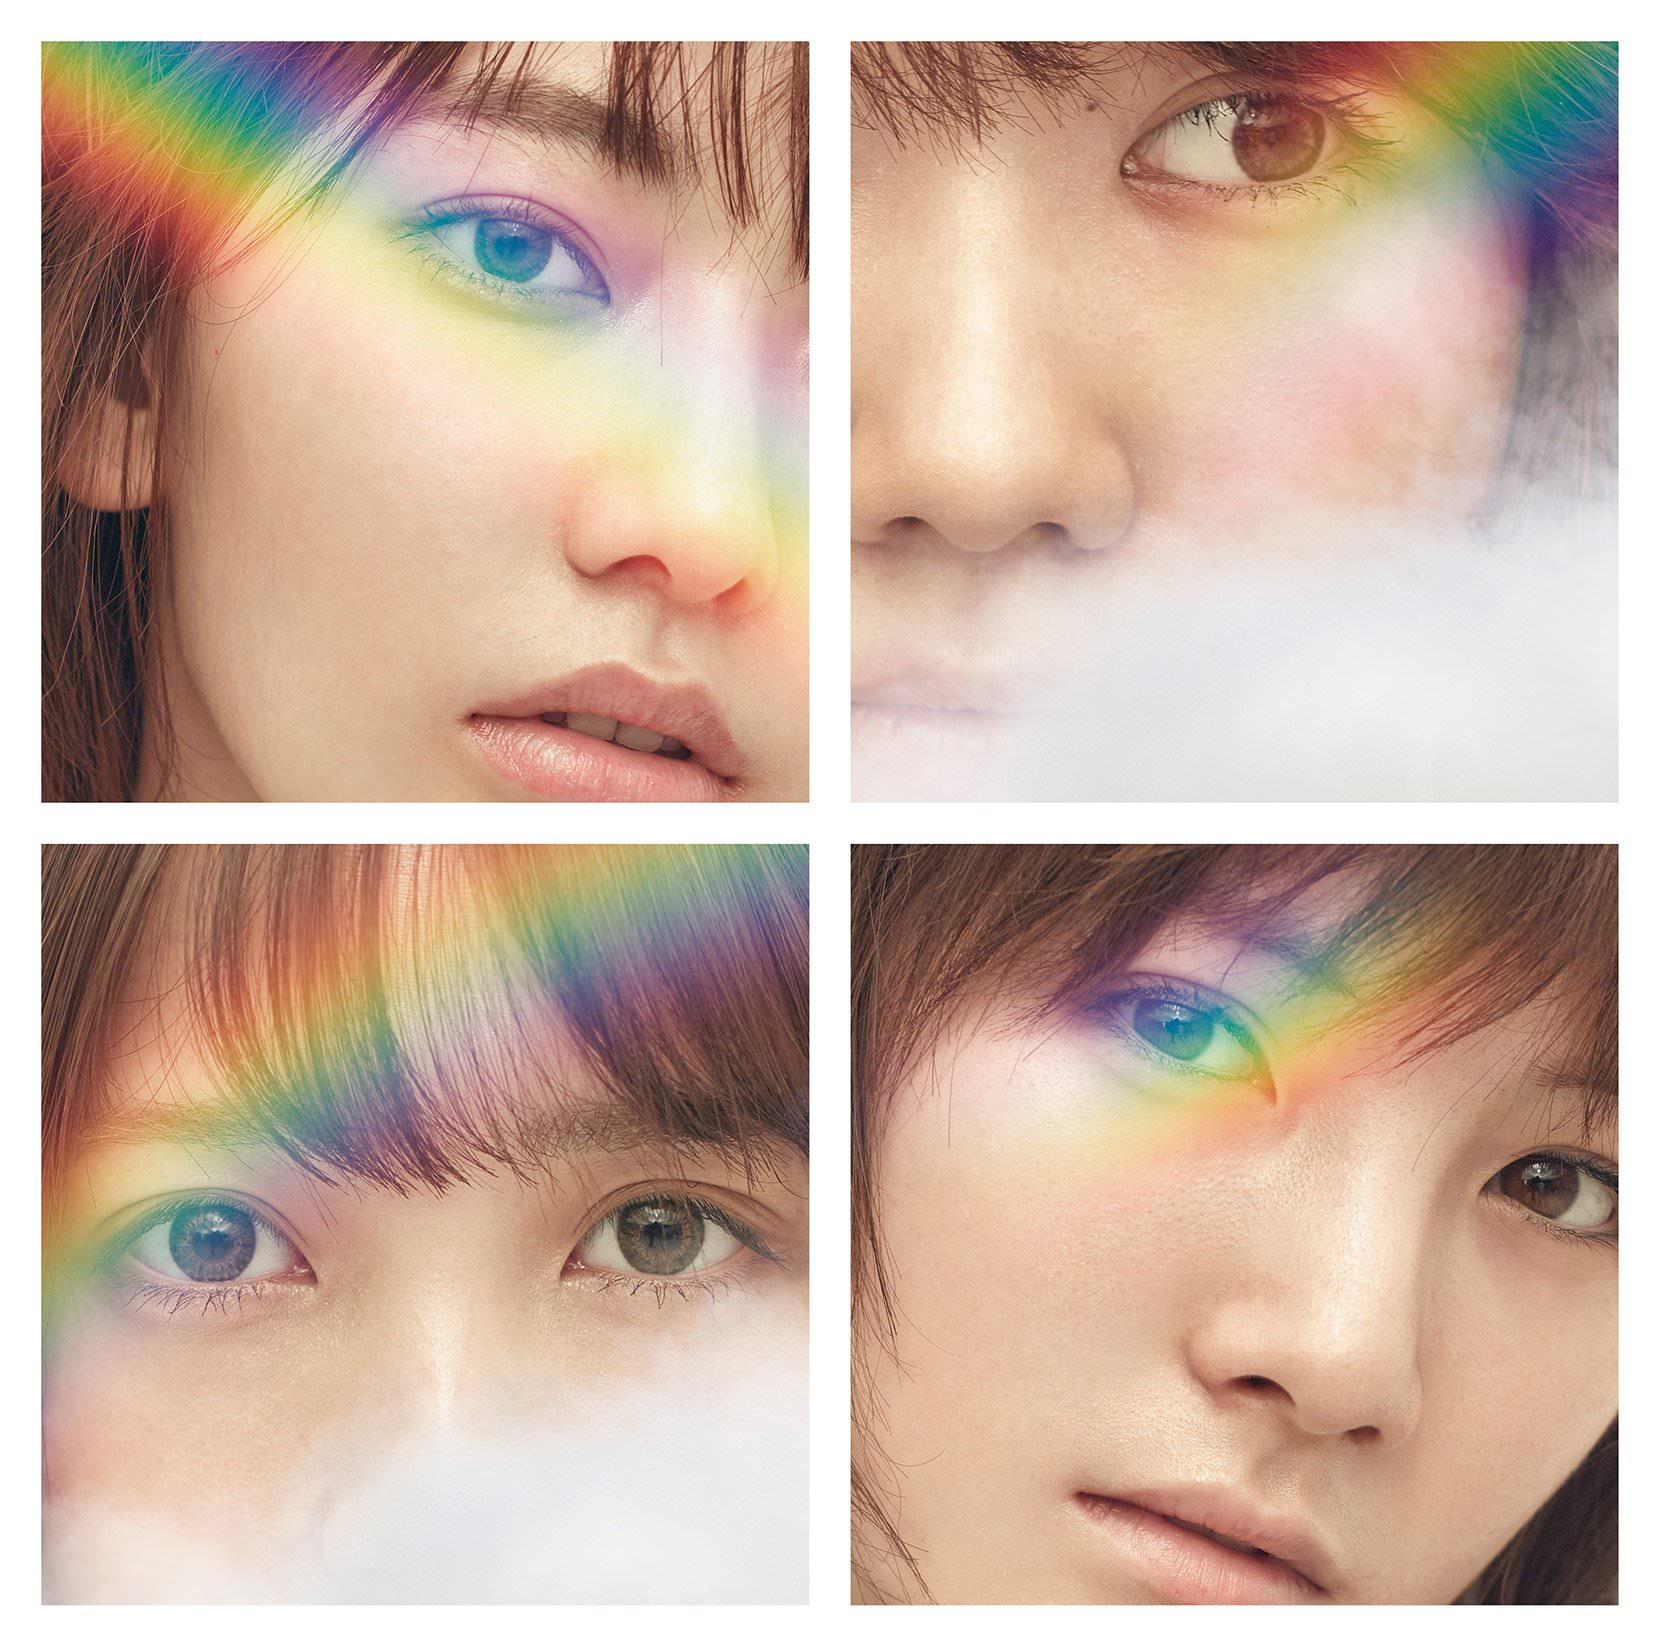 20180810.0048.06 AKB48 - 11gatsu no Anklet (Type B) (DVD) (JPOP.ru) cover 04.jpg